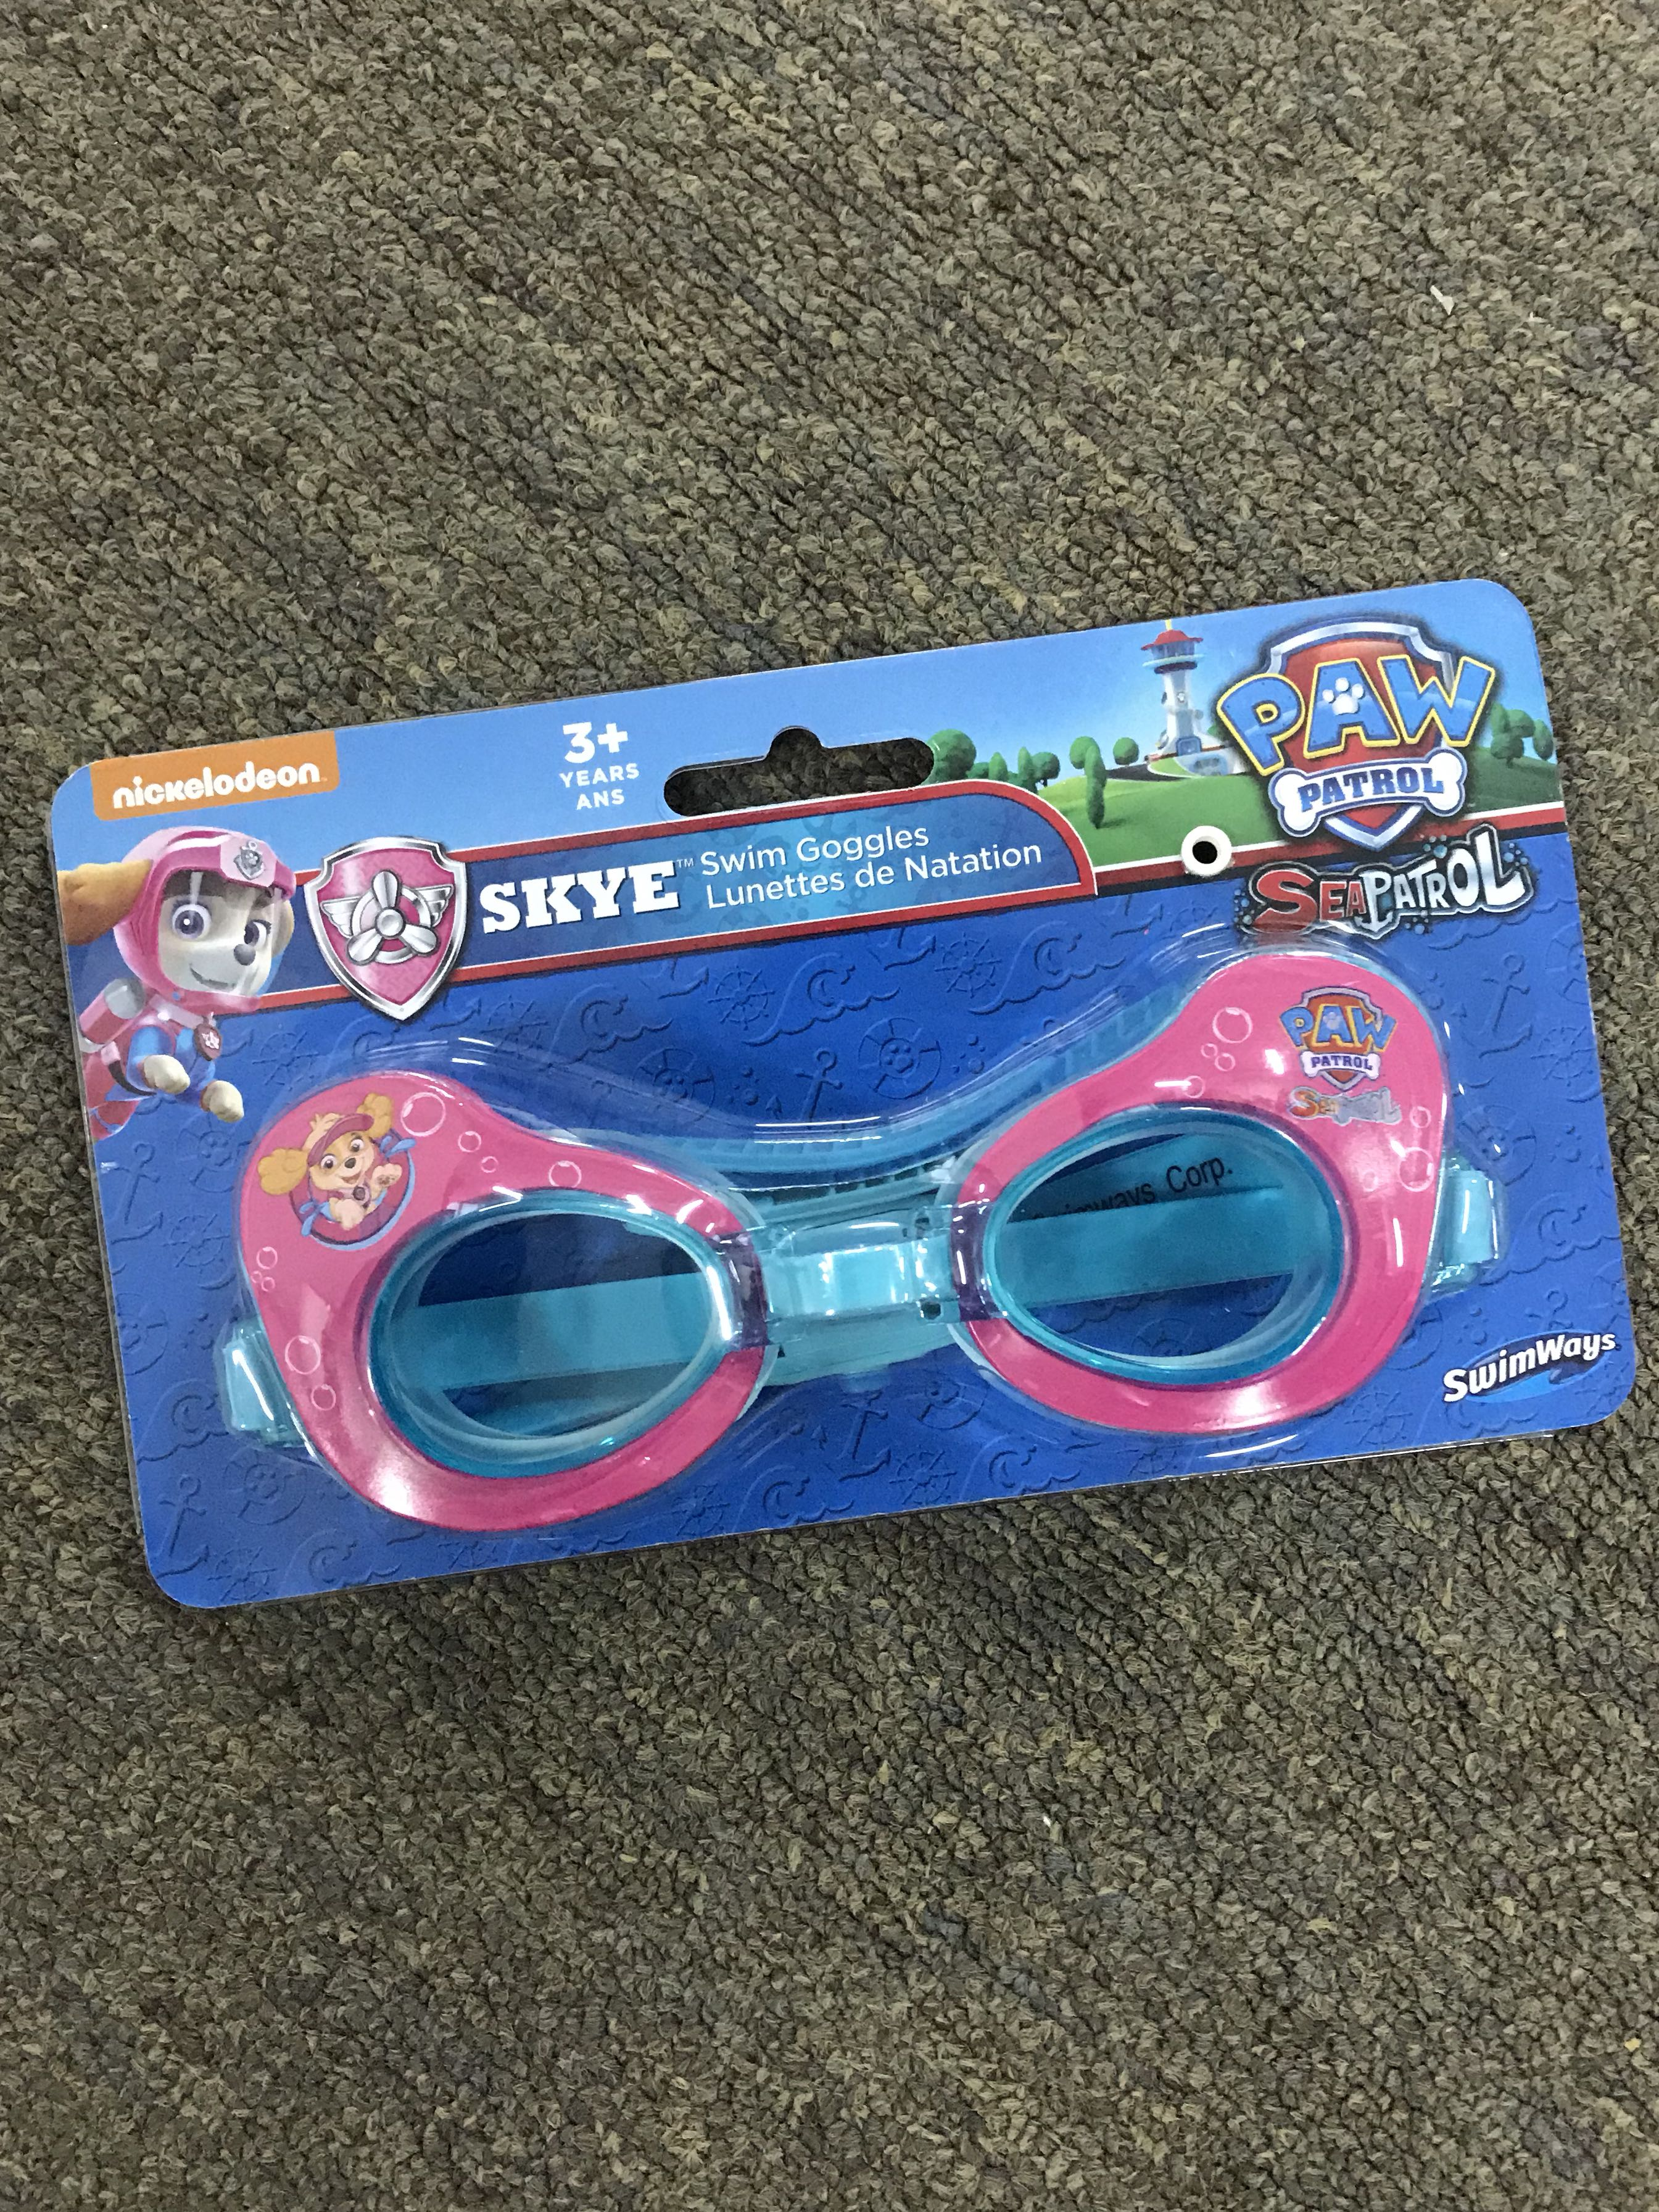 0f6d1c6ced BN SwimWays Paw Patrol Swim Goggles Skye